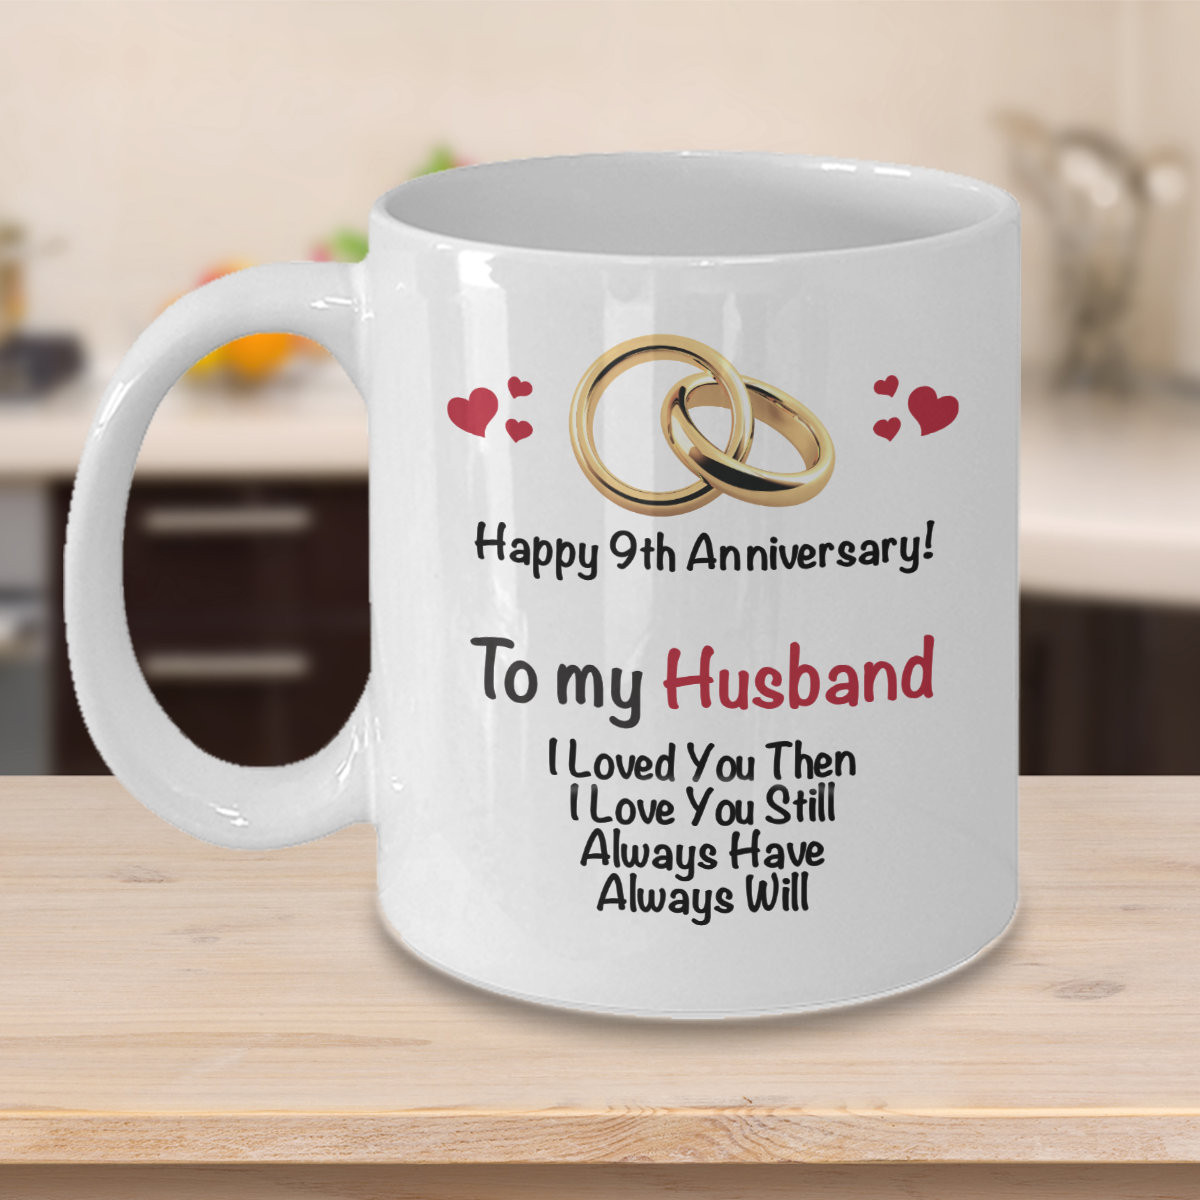 Husband Anniversary Gift Ideas  9th Anniversary Gift Ideas for Husband 9th Wedding